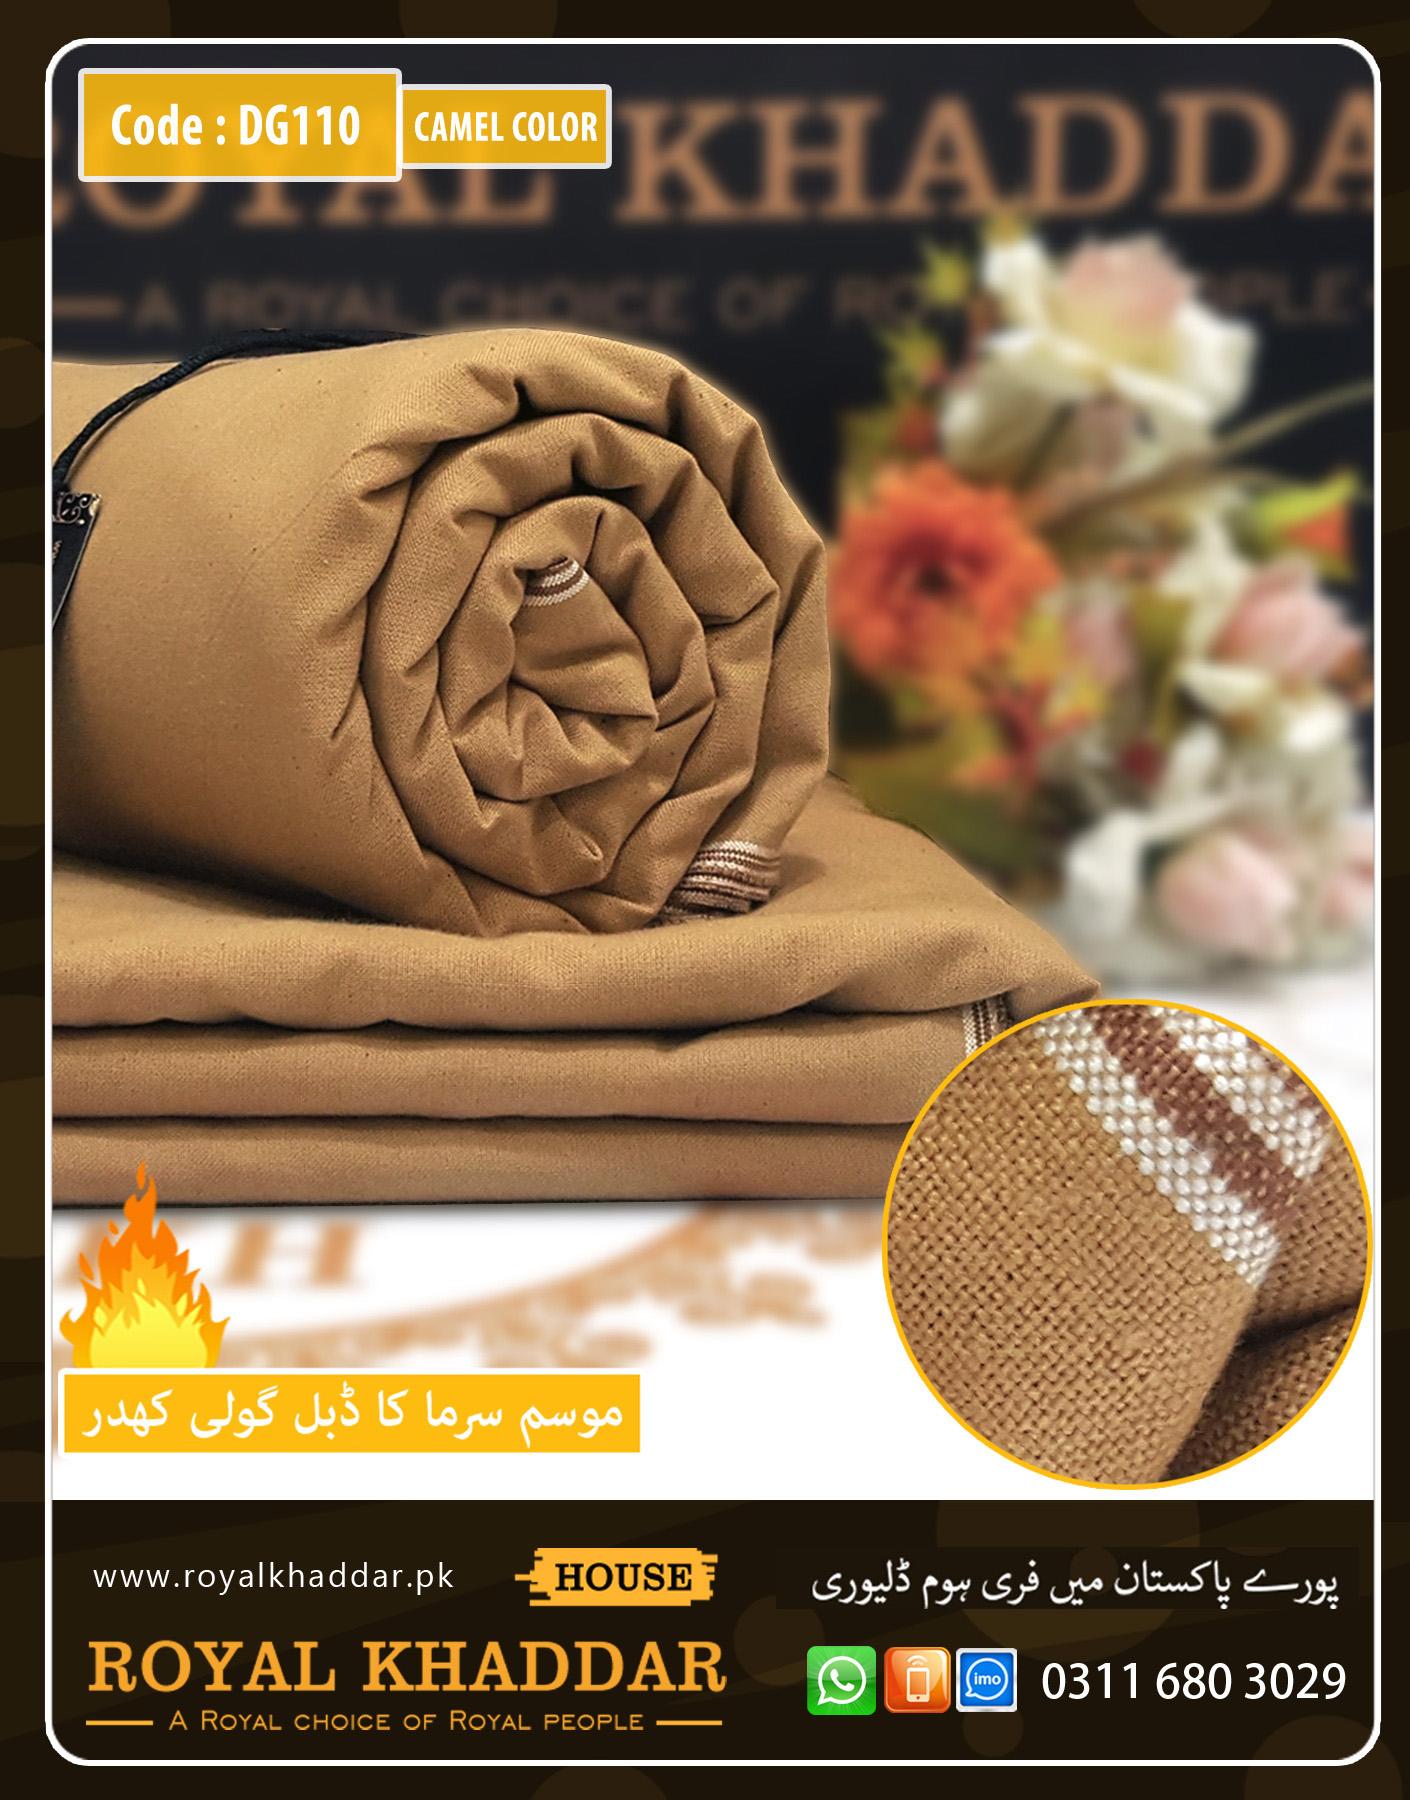 DG110 Camel Color Double Goli Winter Khaddar